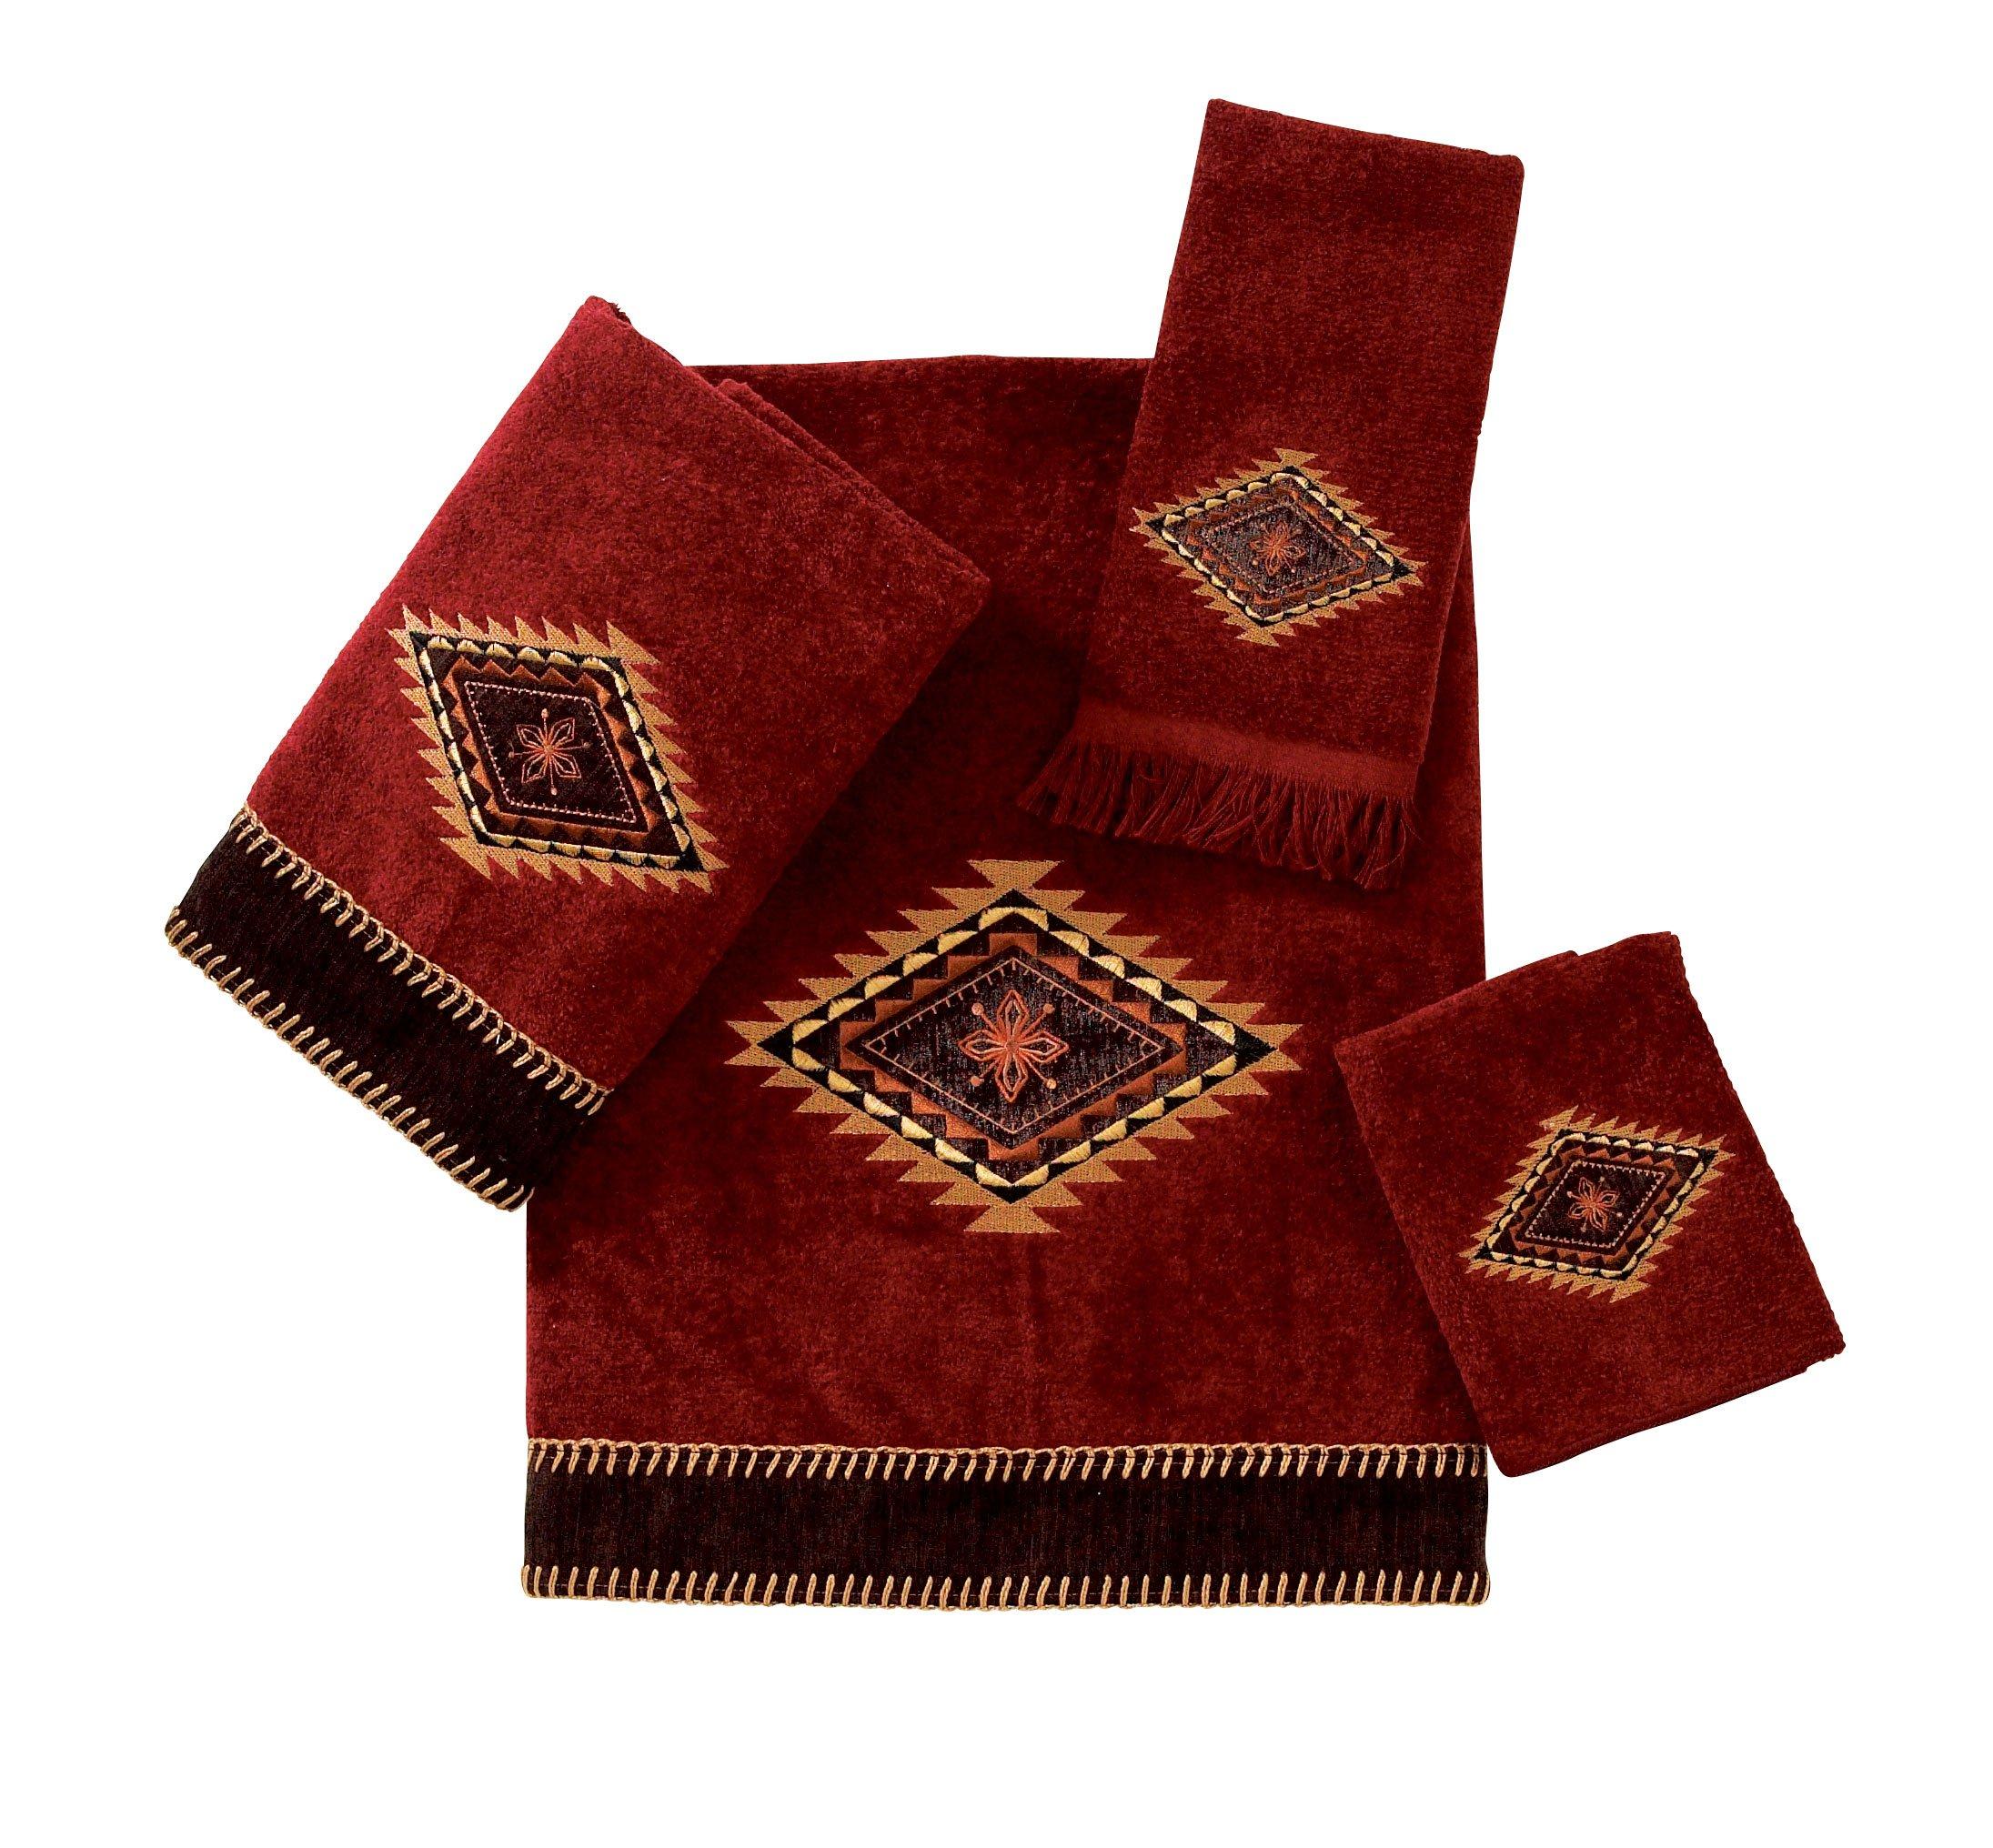 Avanti Linens Mojave   Embroidered 4-Piece Decorative Towel Set Brick